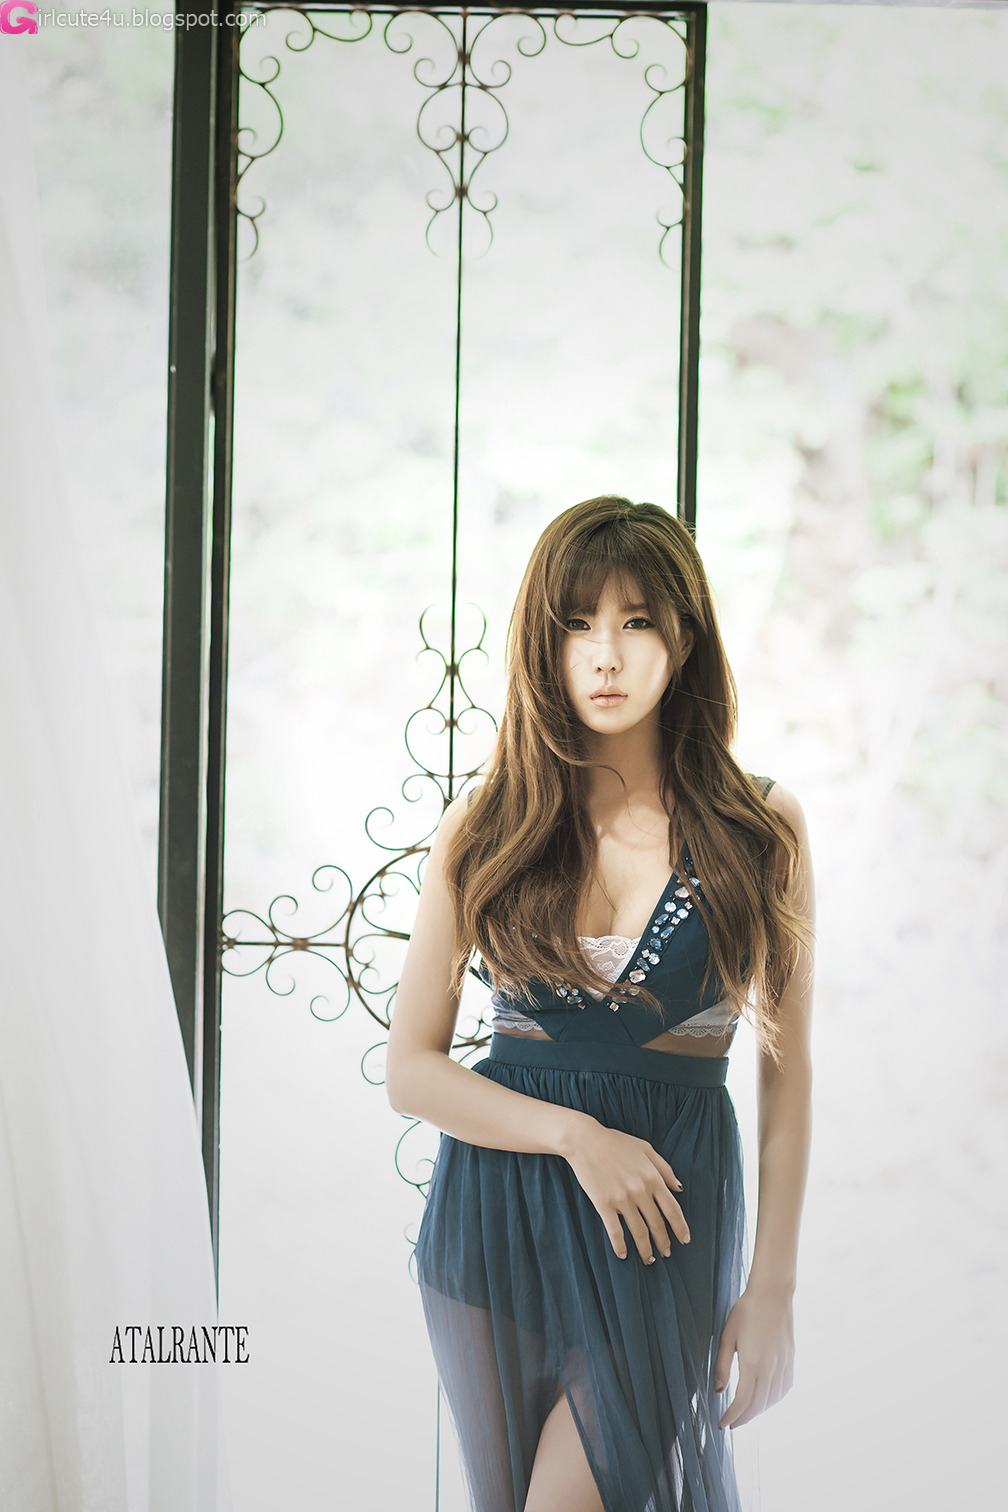 xxx nude girls: Lovely Heo Yoon Mi Again